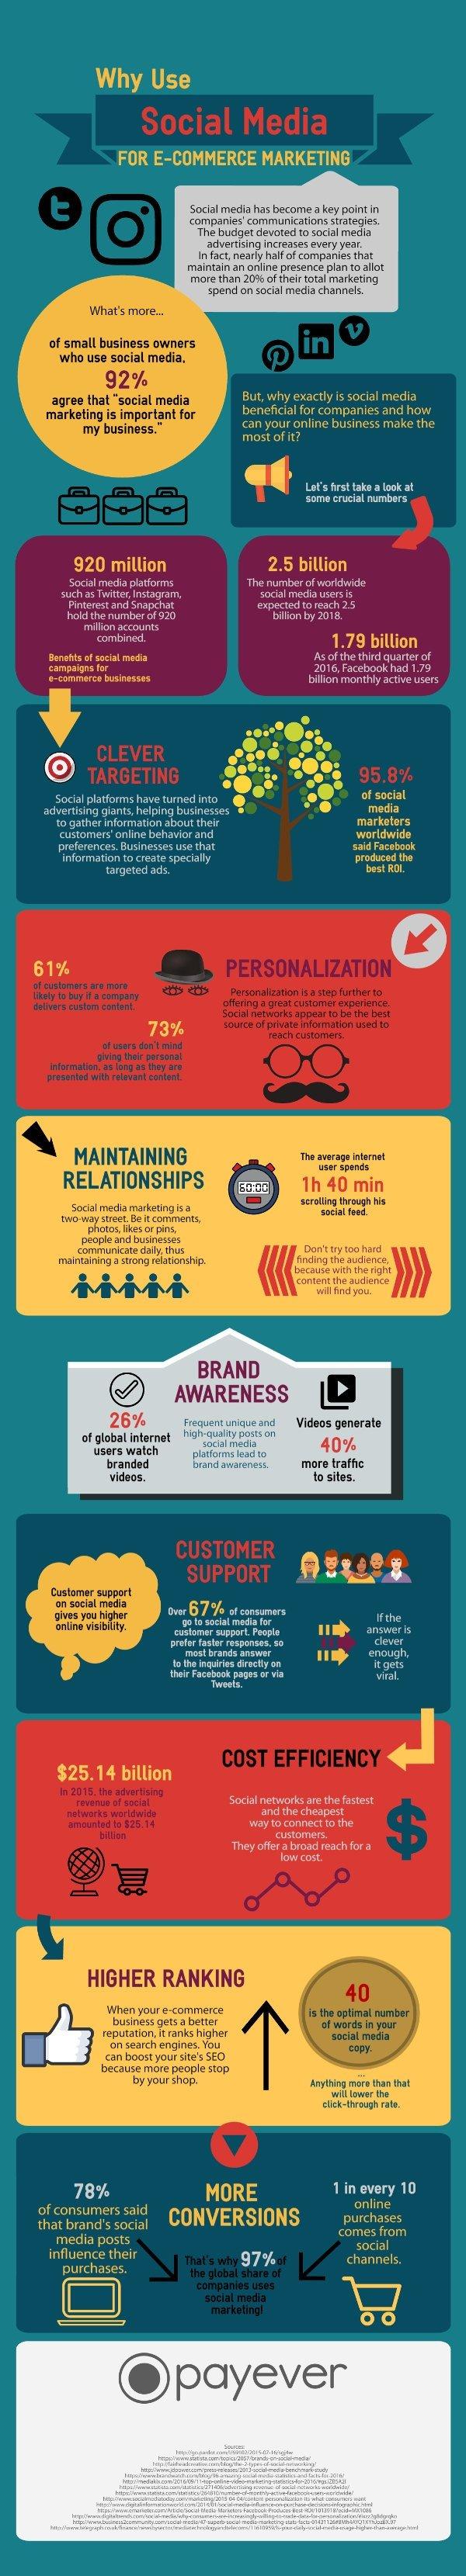 reseaux-sociaux-ecommerce-marketing.jpg